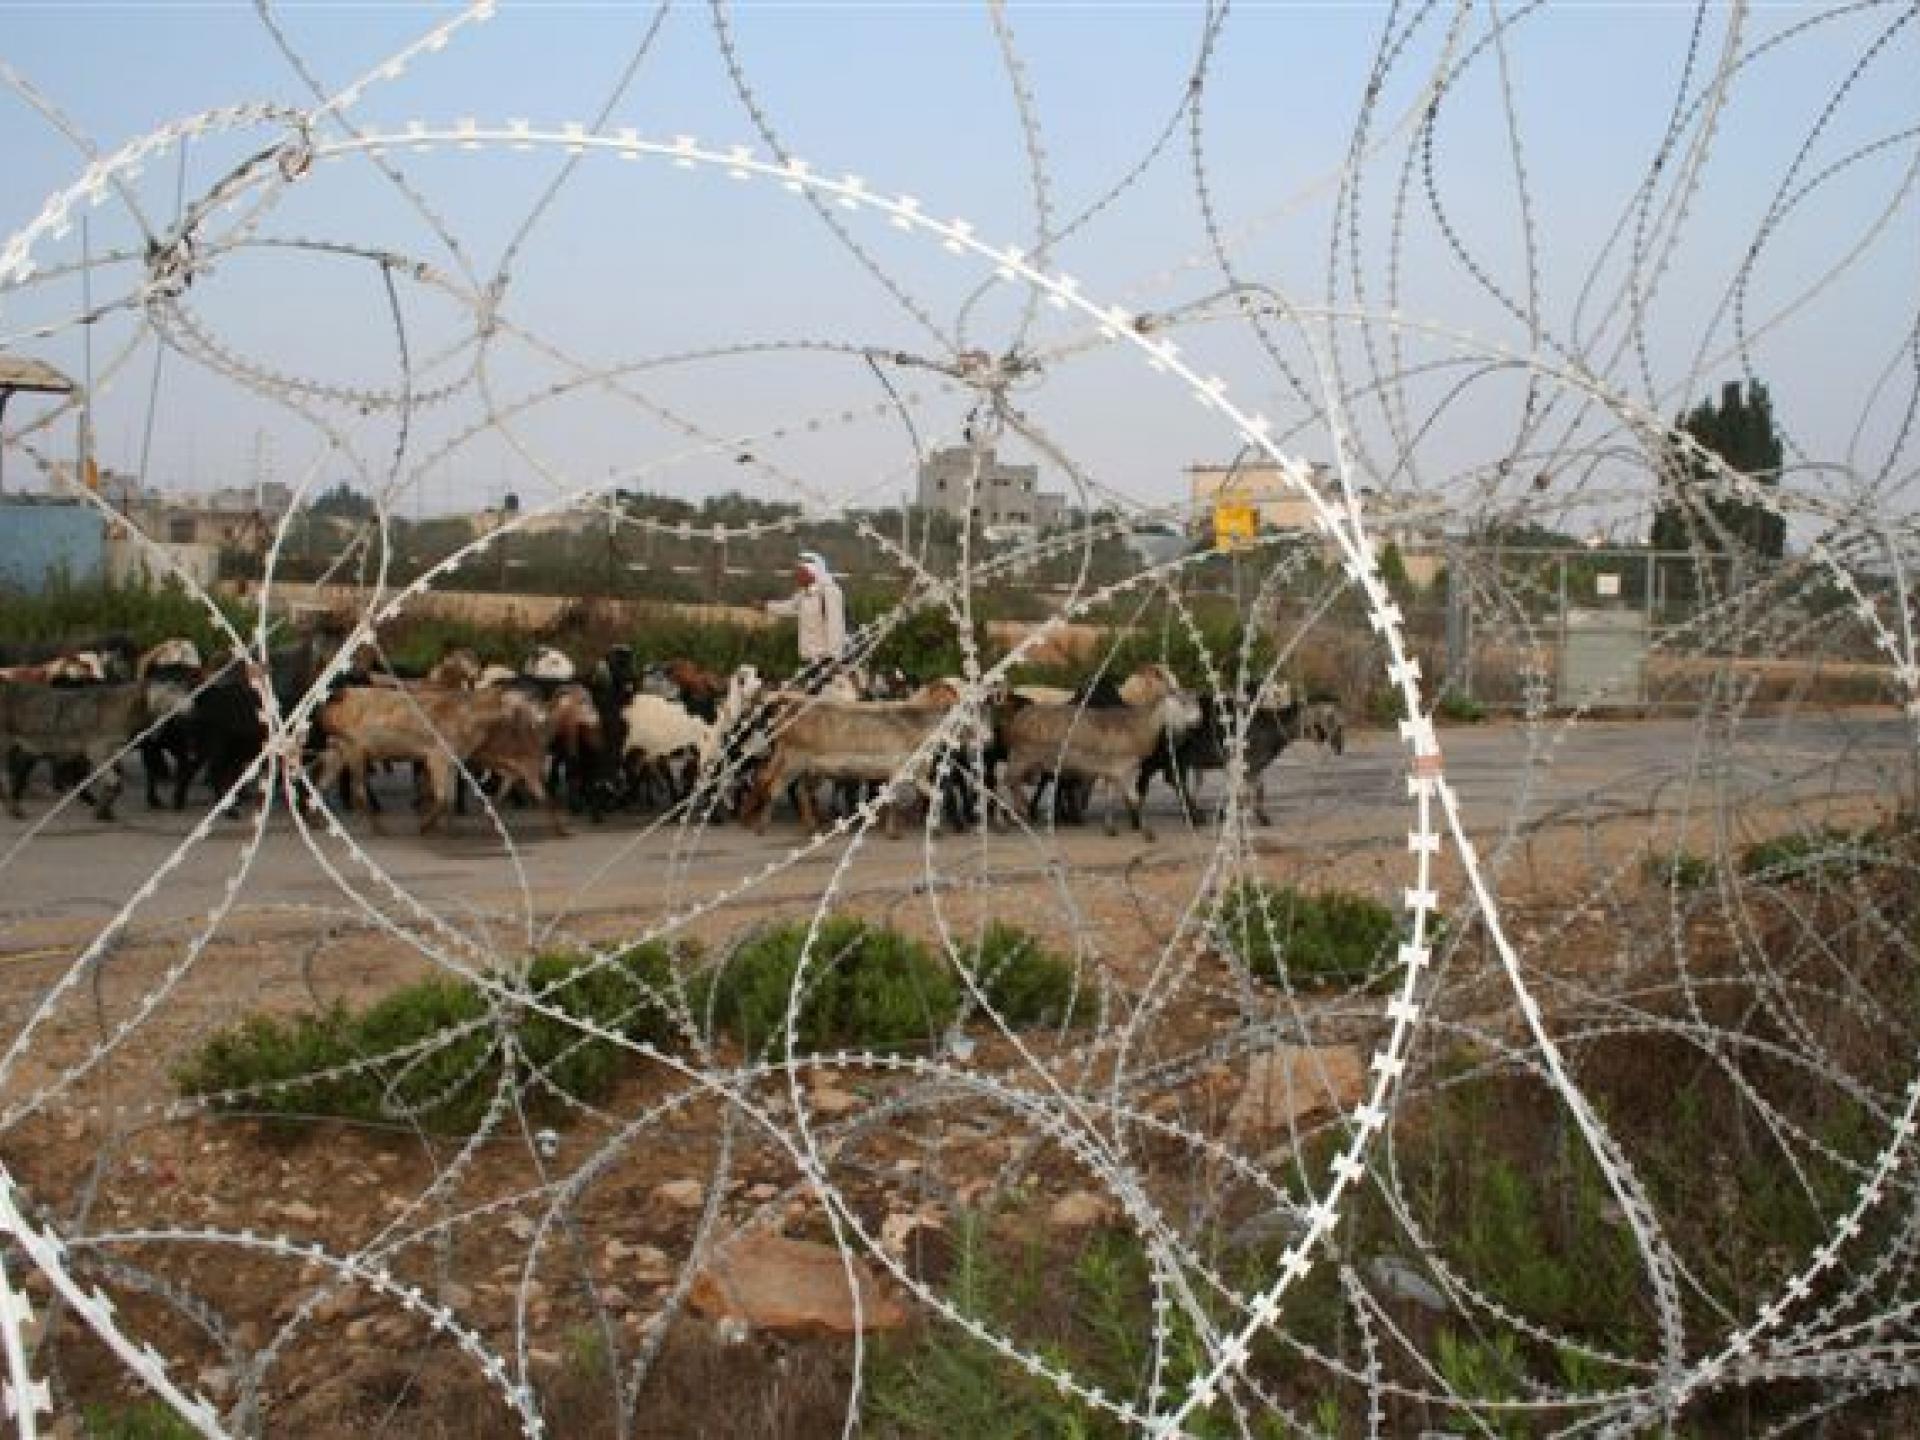 Tura/Shaked checkpoint 13.07.08